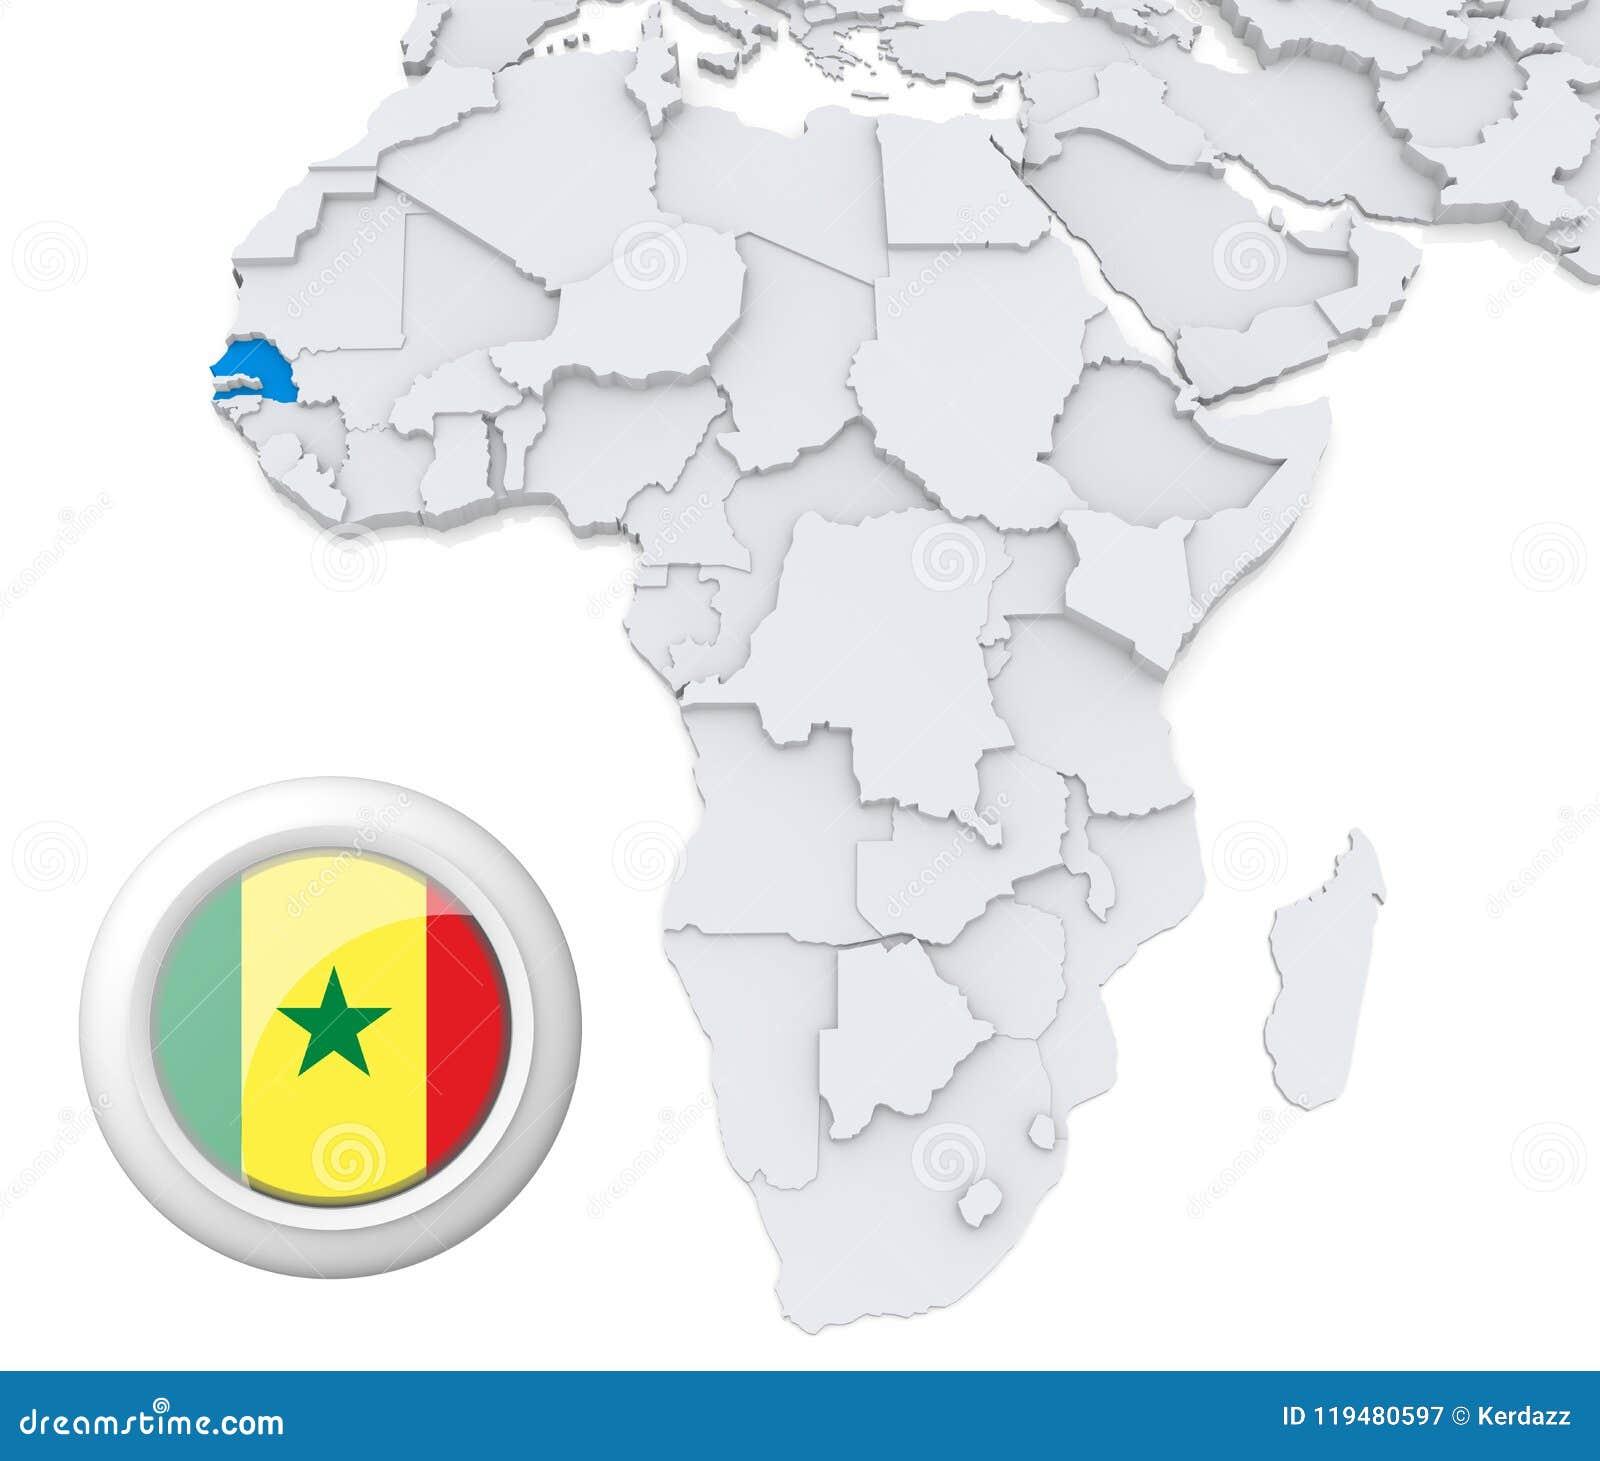 Senegal on Africa map stock illustration. Illustration of basic